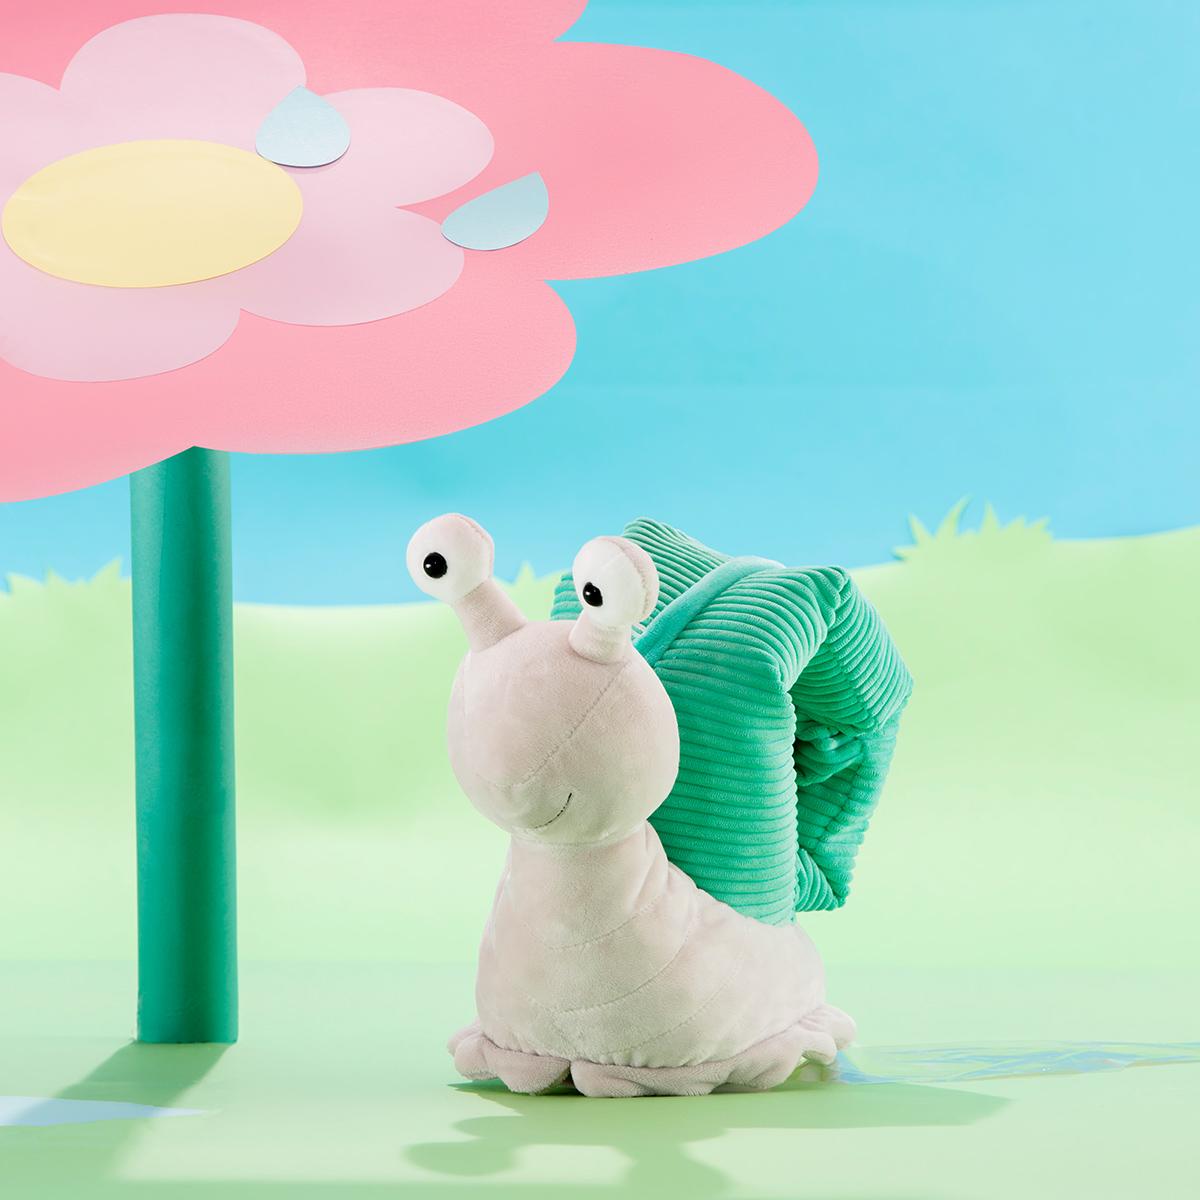 sia-the-snail-scentsy-buddysia-the-snail-scentsy-buddy